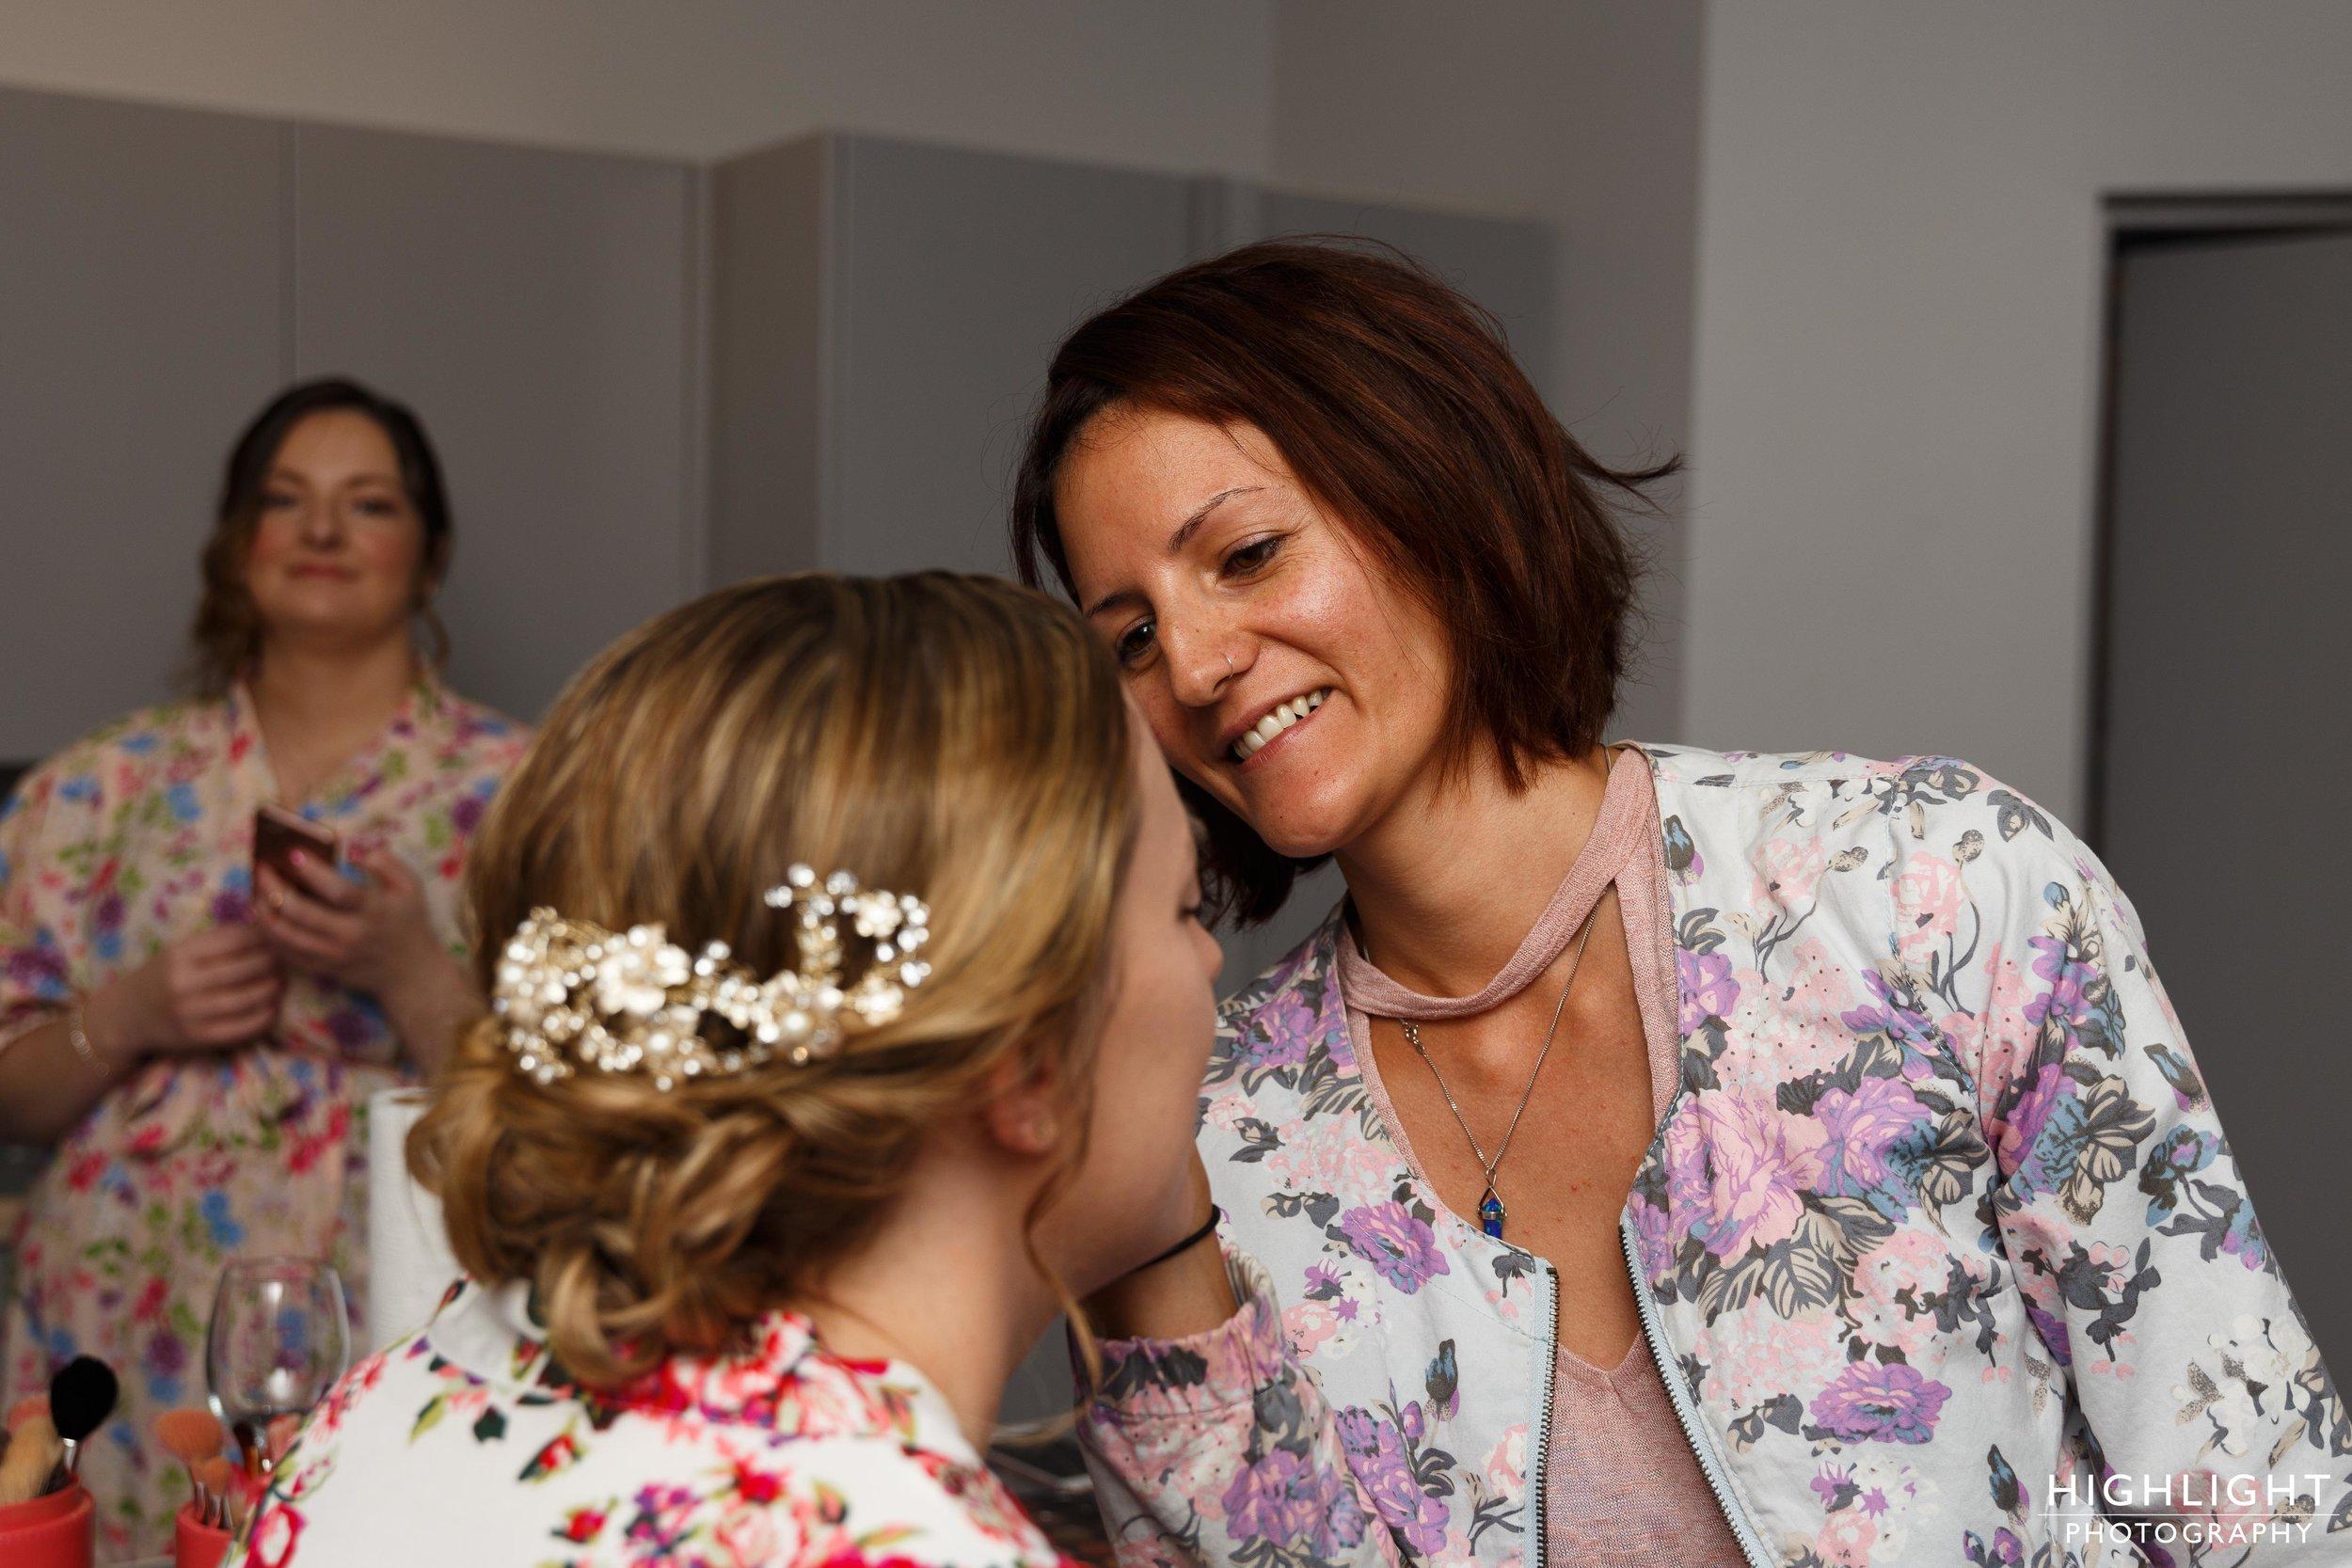 highlight-wedding-photography-palmerston-north-new-zealand-manawatu-chalet-3.jpg